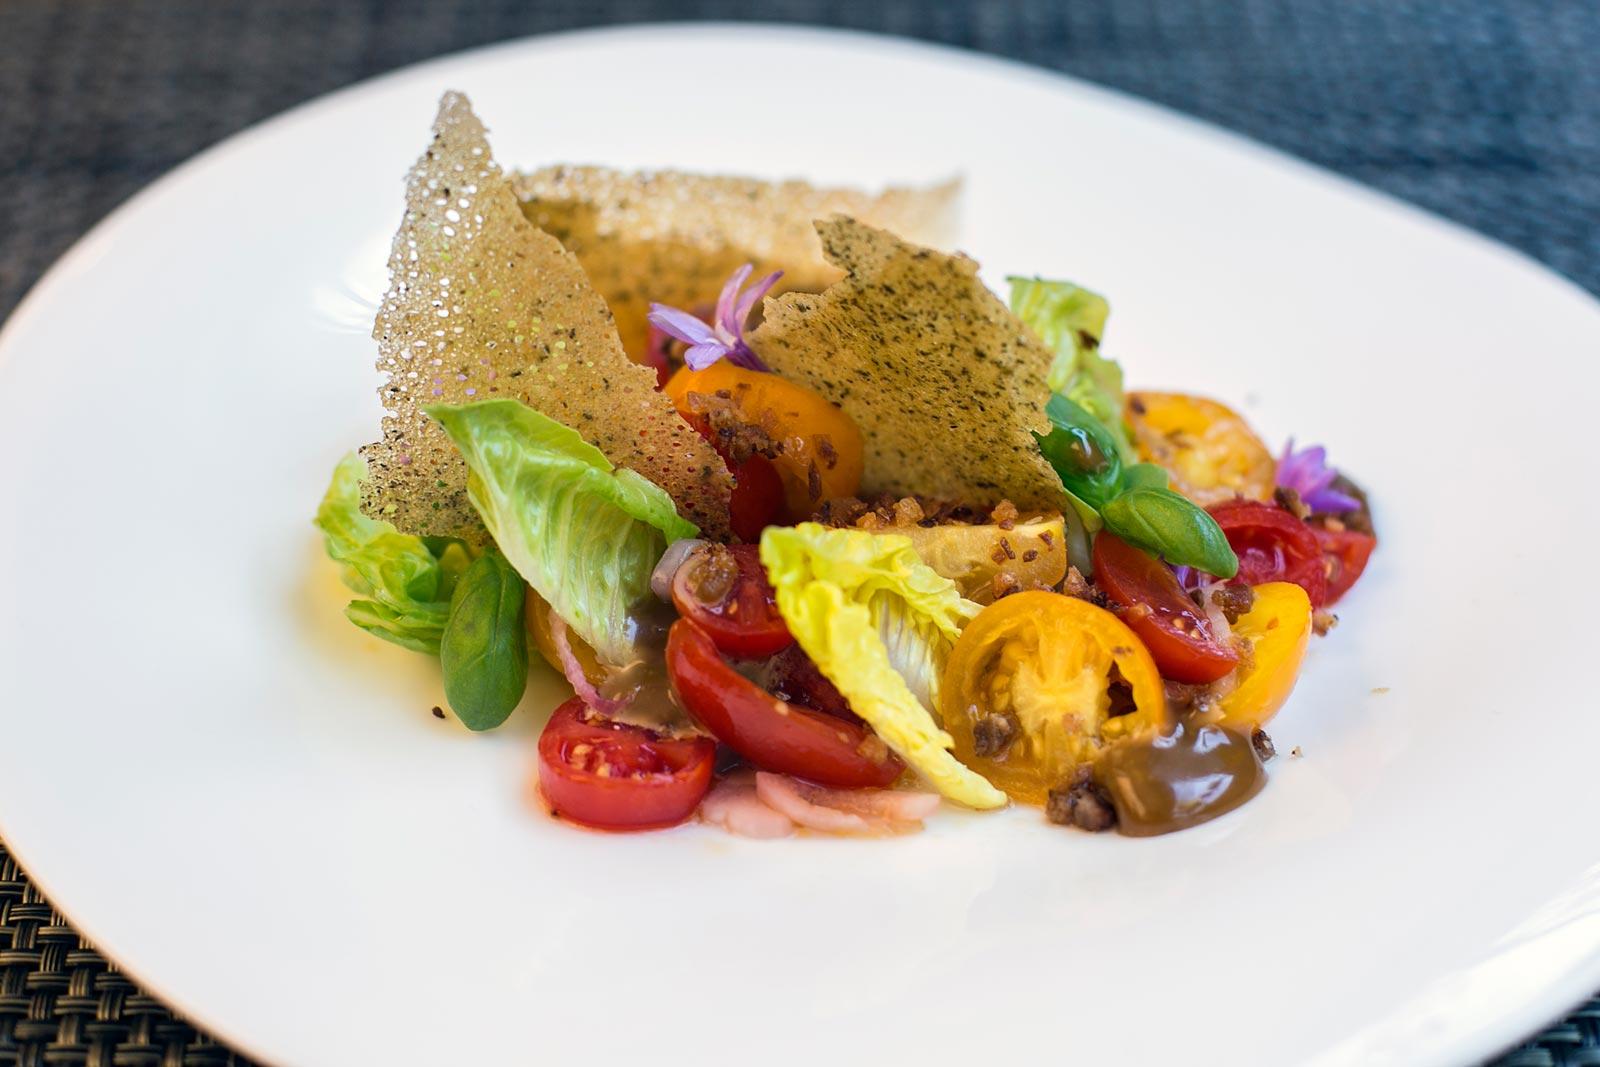 Experiencing Celebrity Chef Monica Galetti's Mere 10